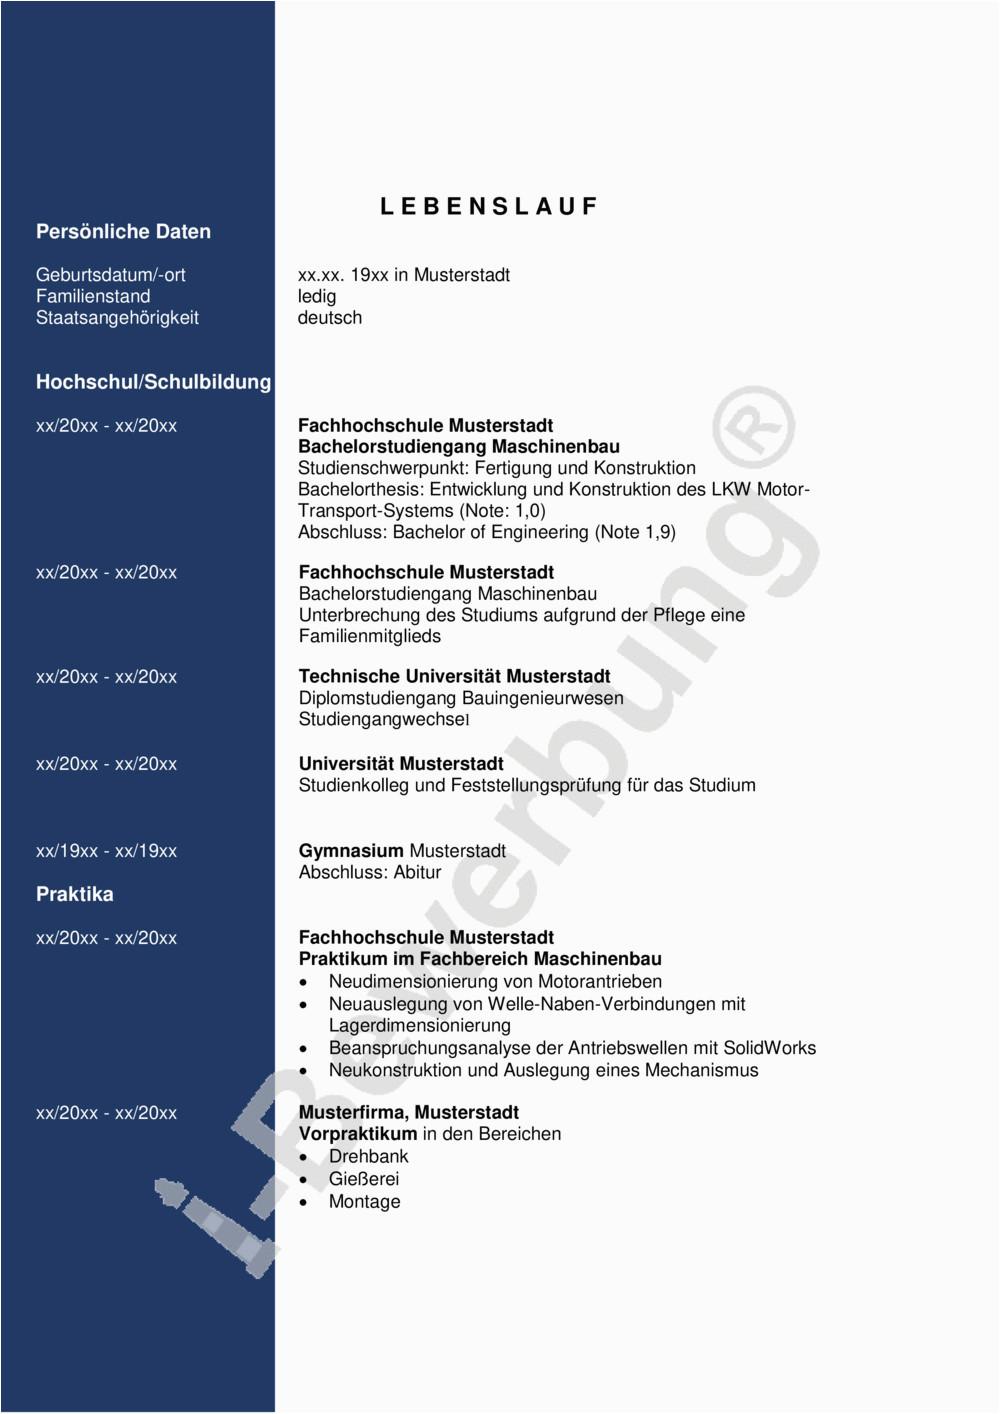 Initiativbewerbung Konstruktionsingenieur Lebenslauf Axel 635 pdf